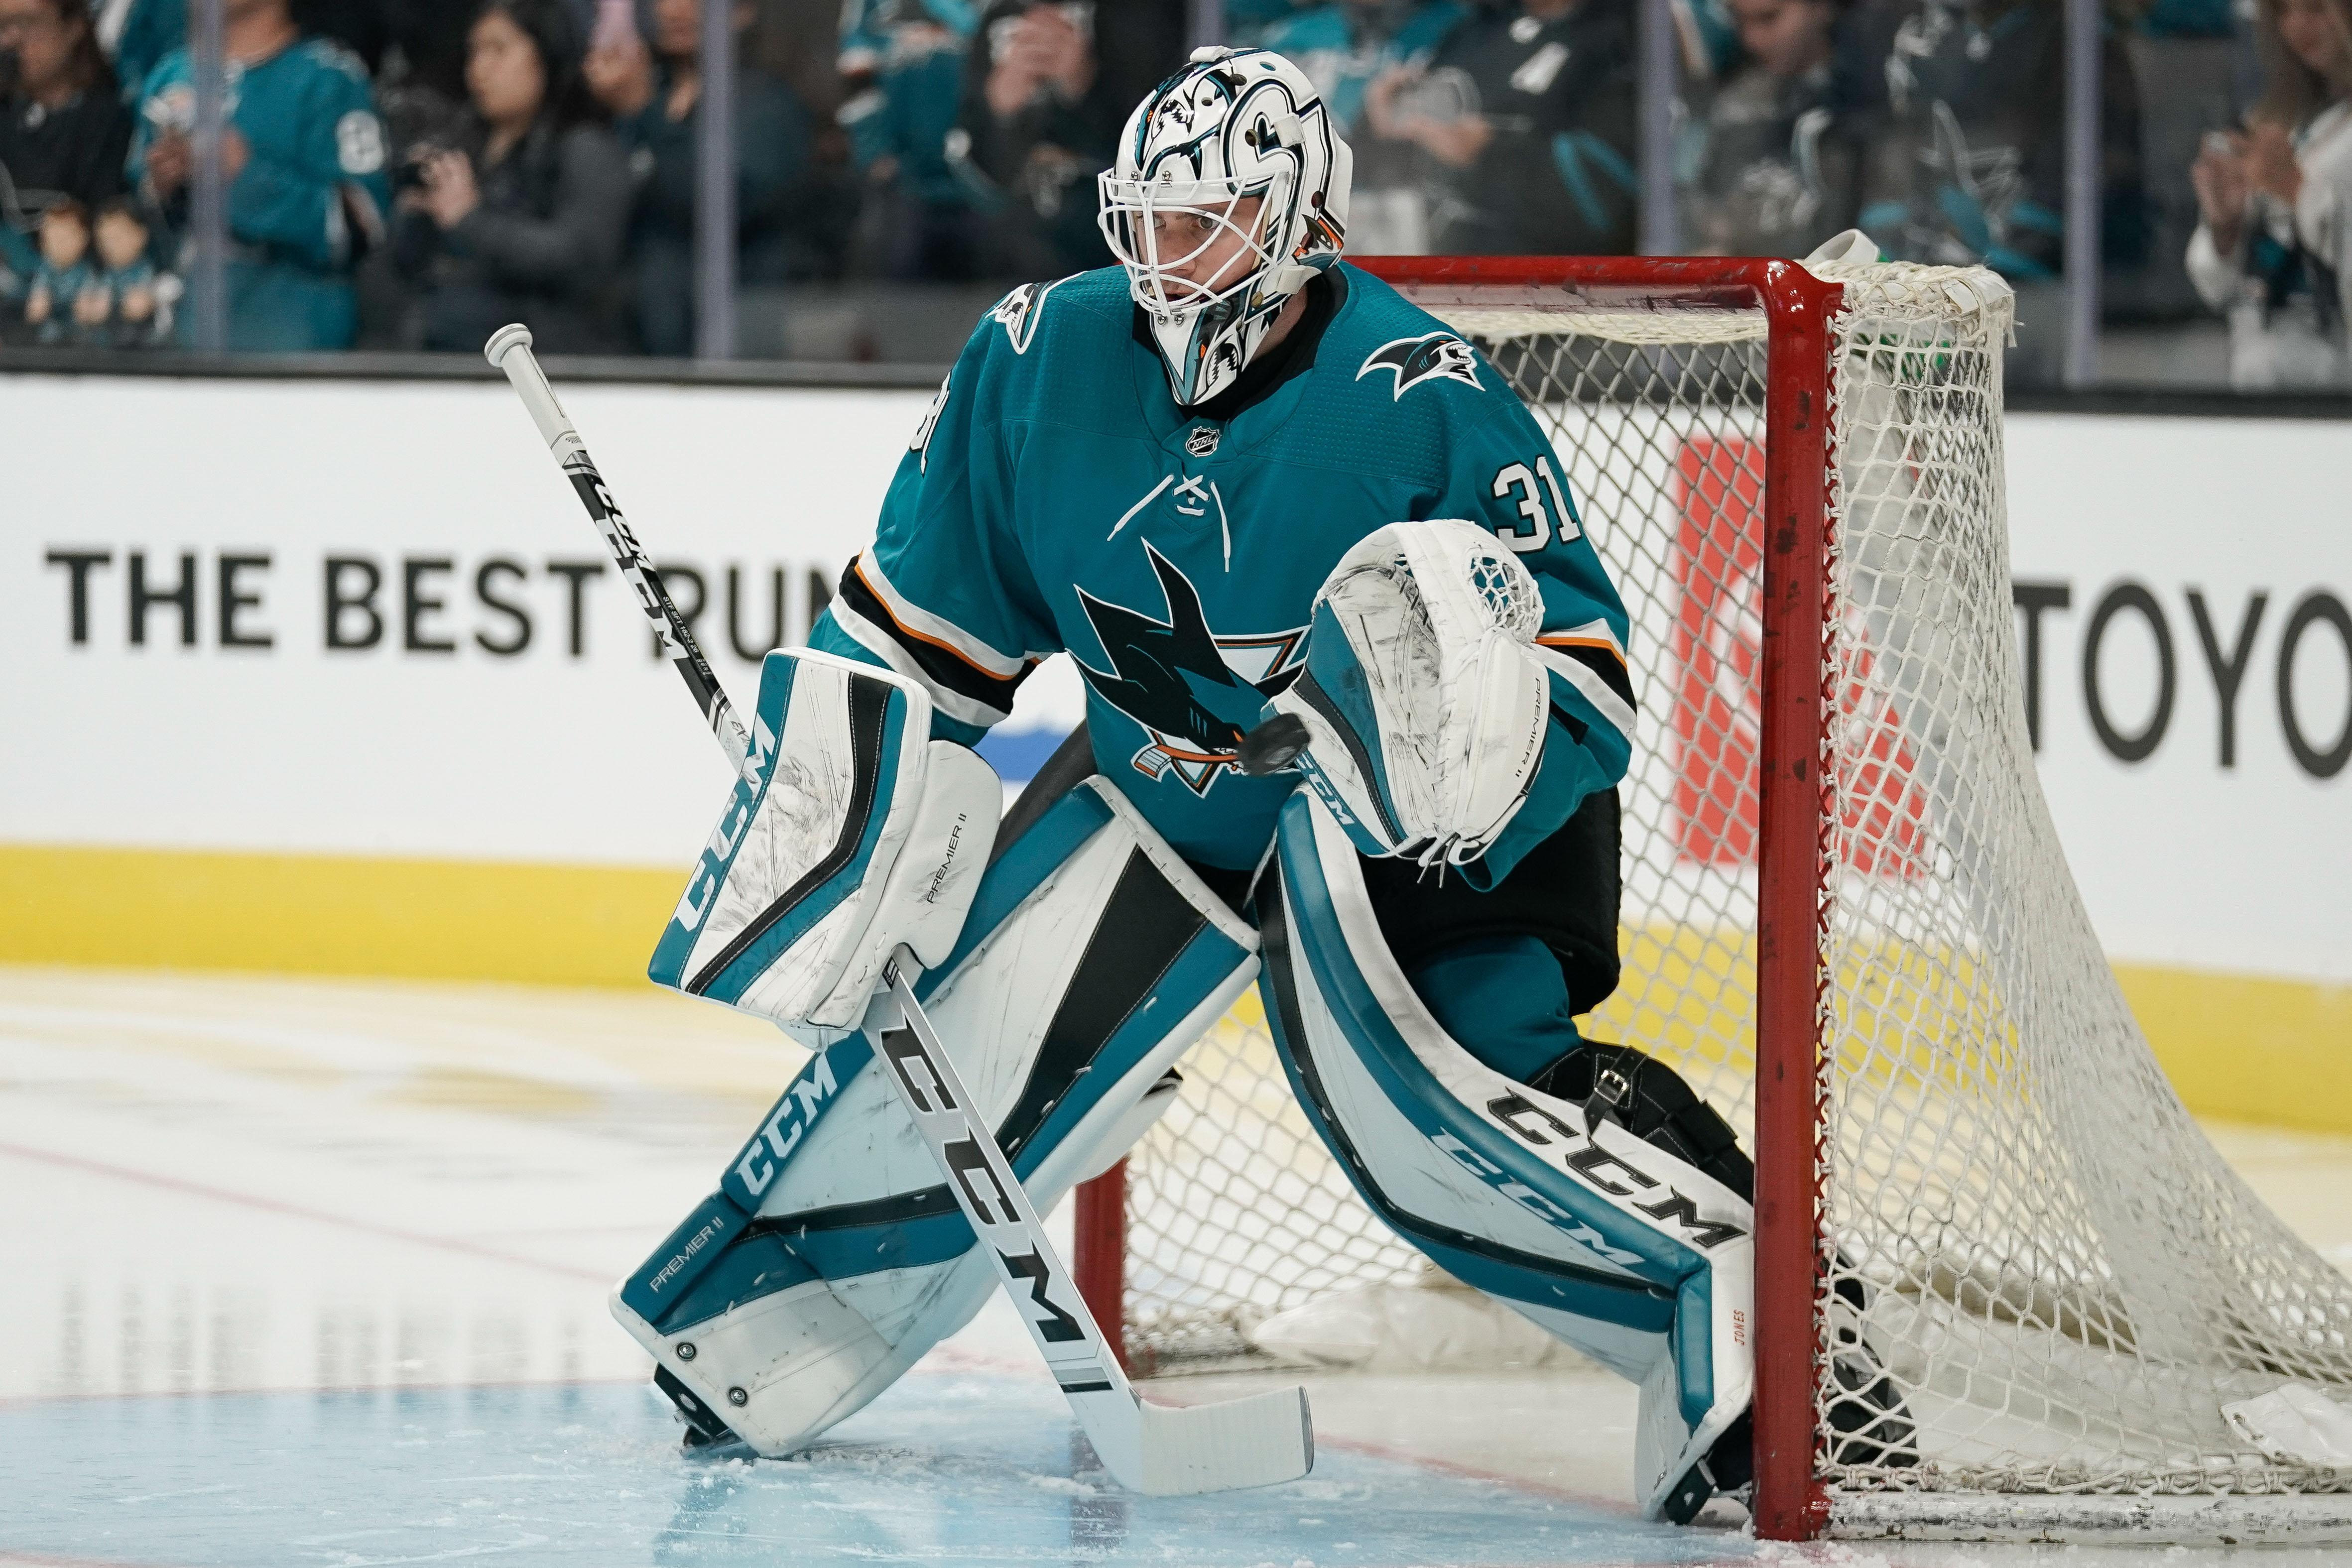 San Jose Sharks may need to consider goaltending change to salvage their season